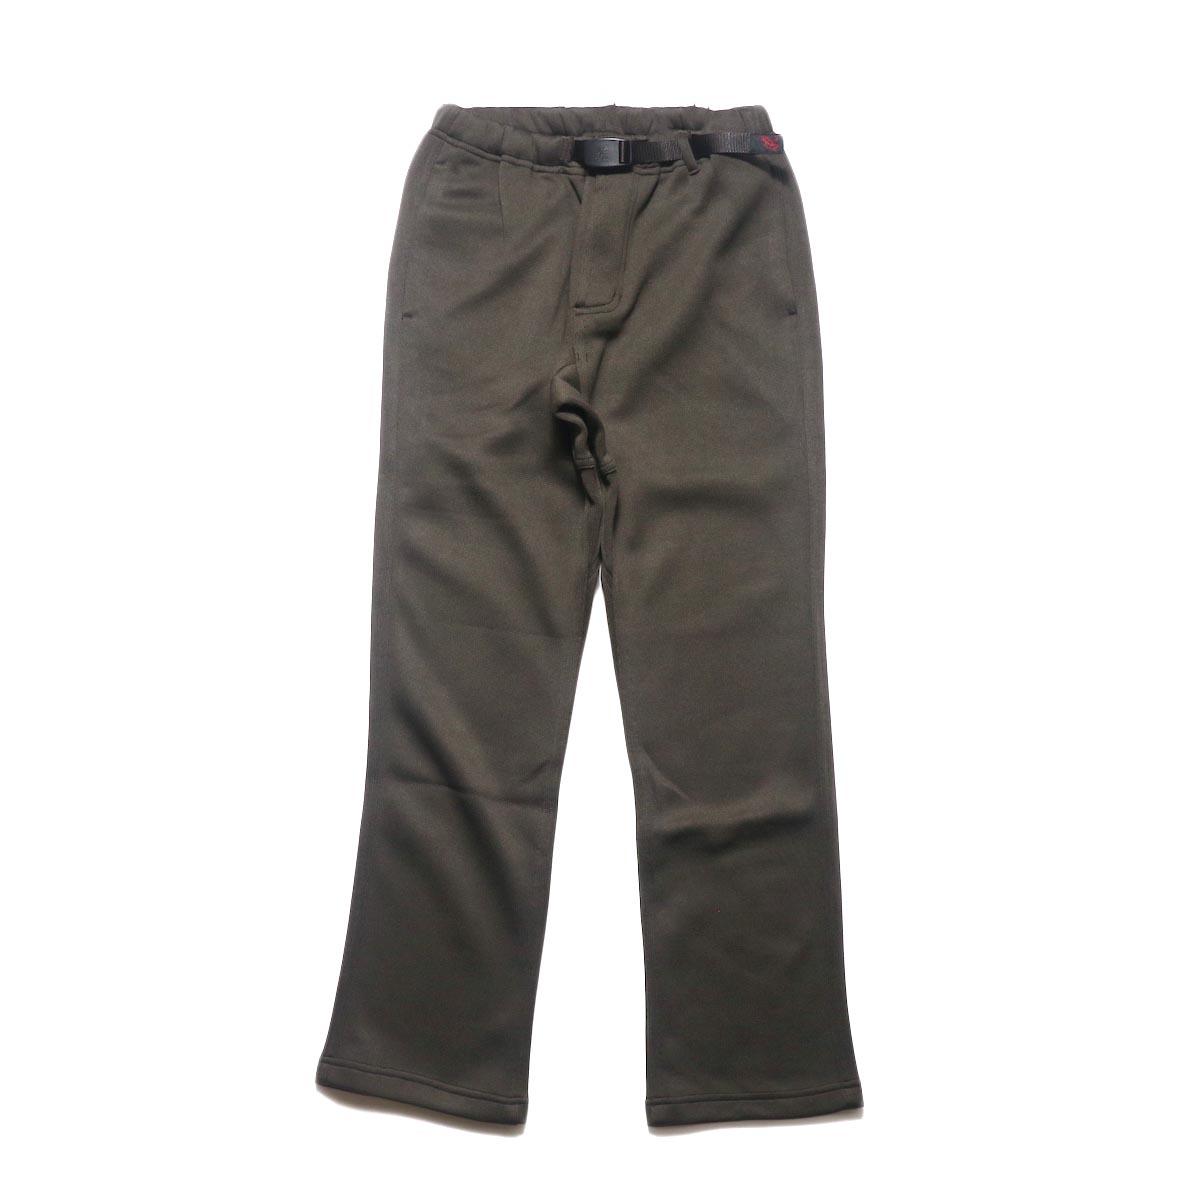 GRAMICCI / BONDING KNIT FLEECE NN-PANTS JUST CUT (Dark Brown)